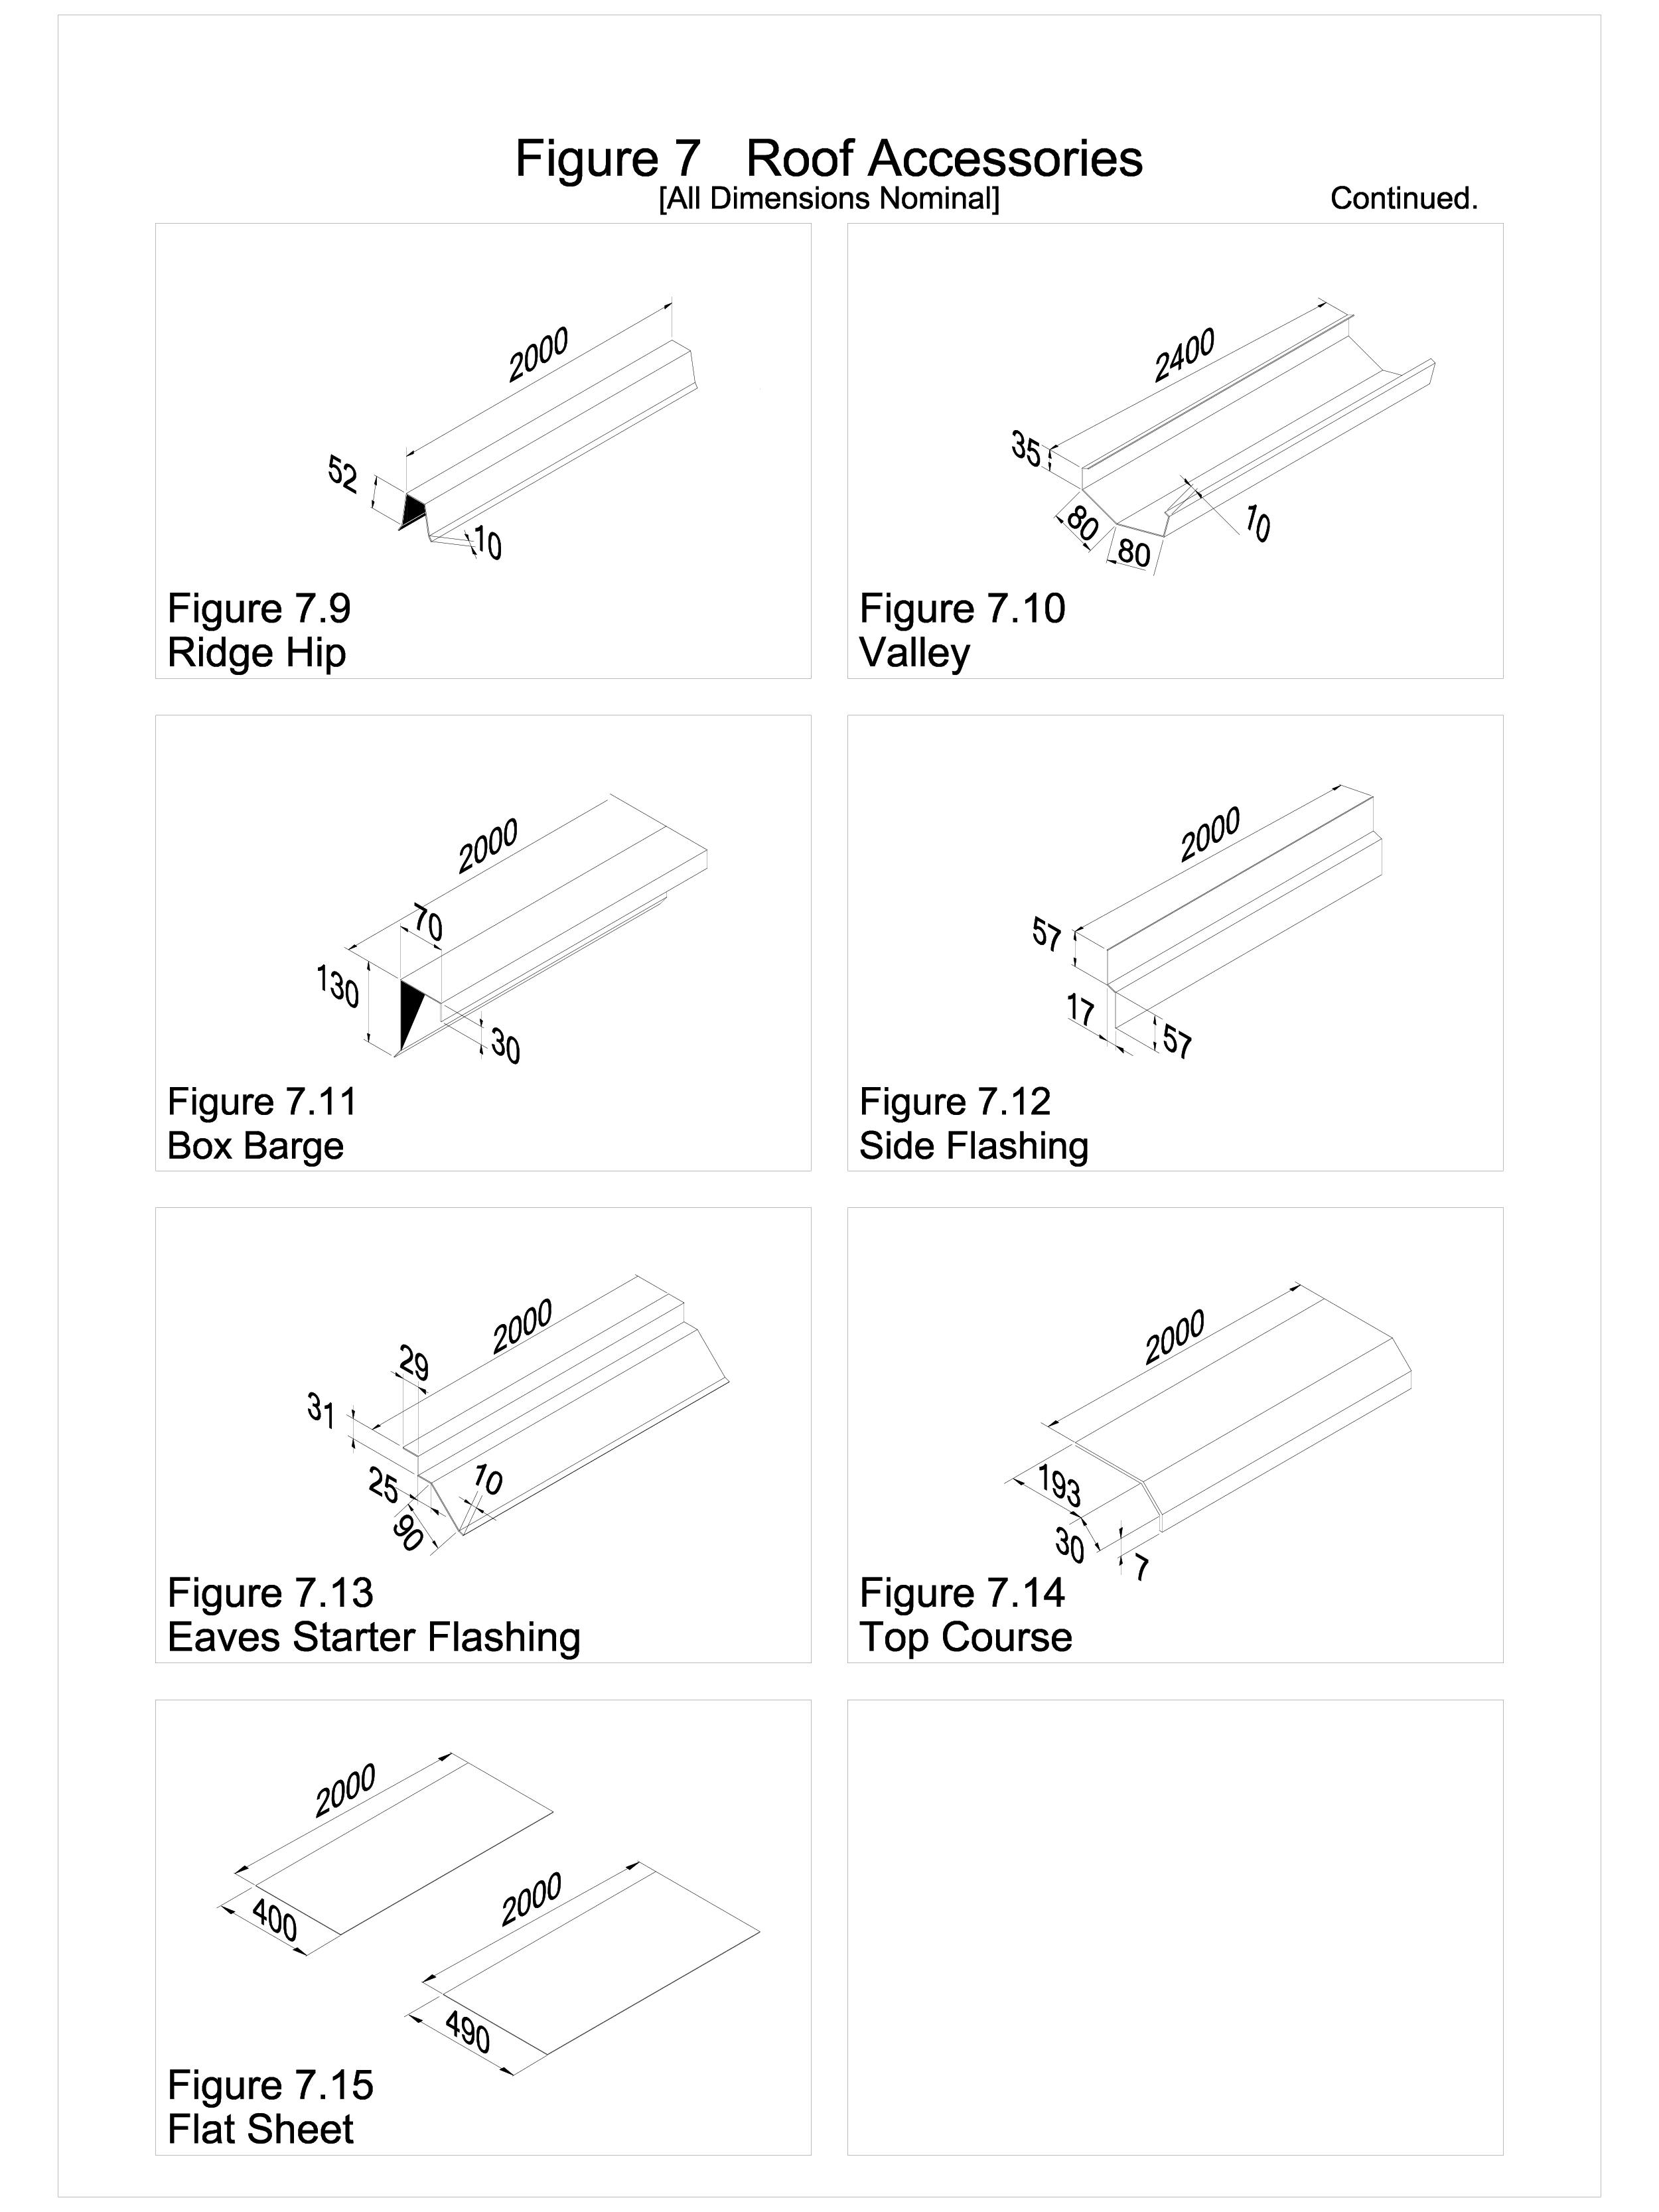 Accesorii pentru invelitori din tabla tip tigla 02 SHAKE, MILANO, HERITAGE, CLASSIC, SHINGLE, DIAMANT GERARD Acoperis cu tigla metalica cu acoperire de piatra naturala FINAL DISTRIBUTION  - Pagina 1